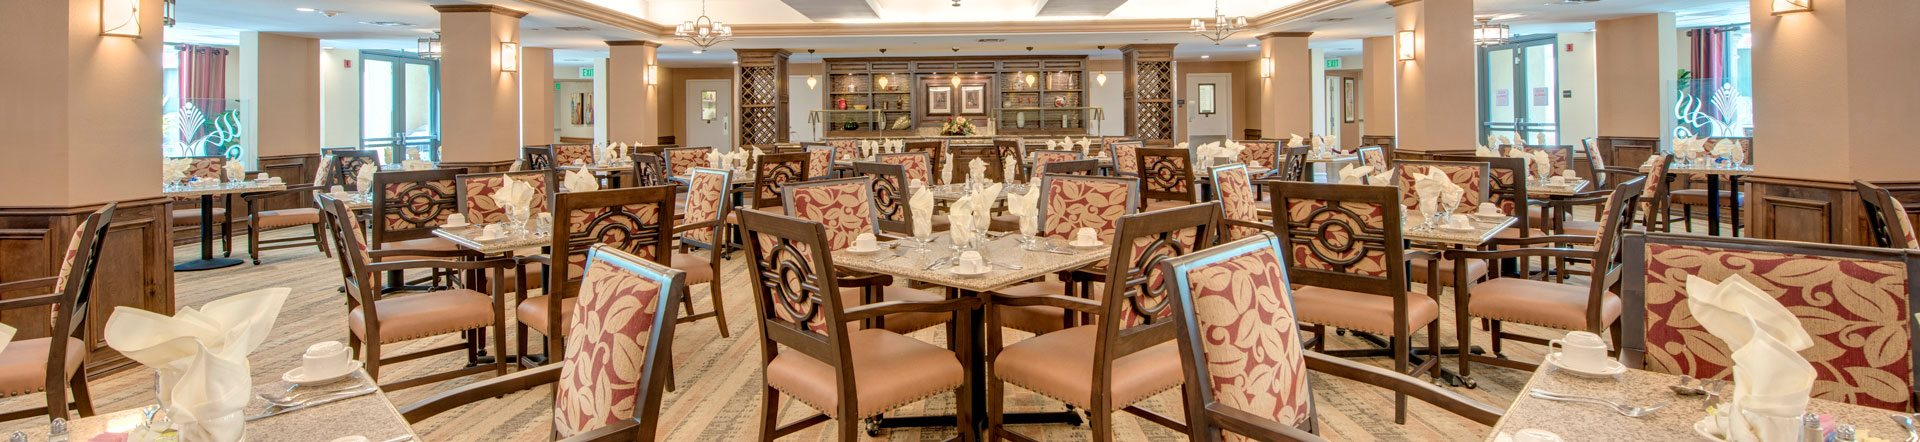 Restaurant-style Dining at Pacifica Senior Living Hillsborough, Chino, 91710